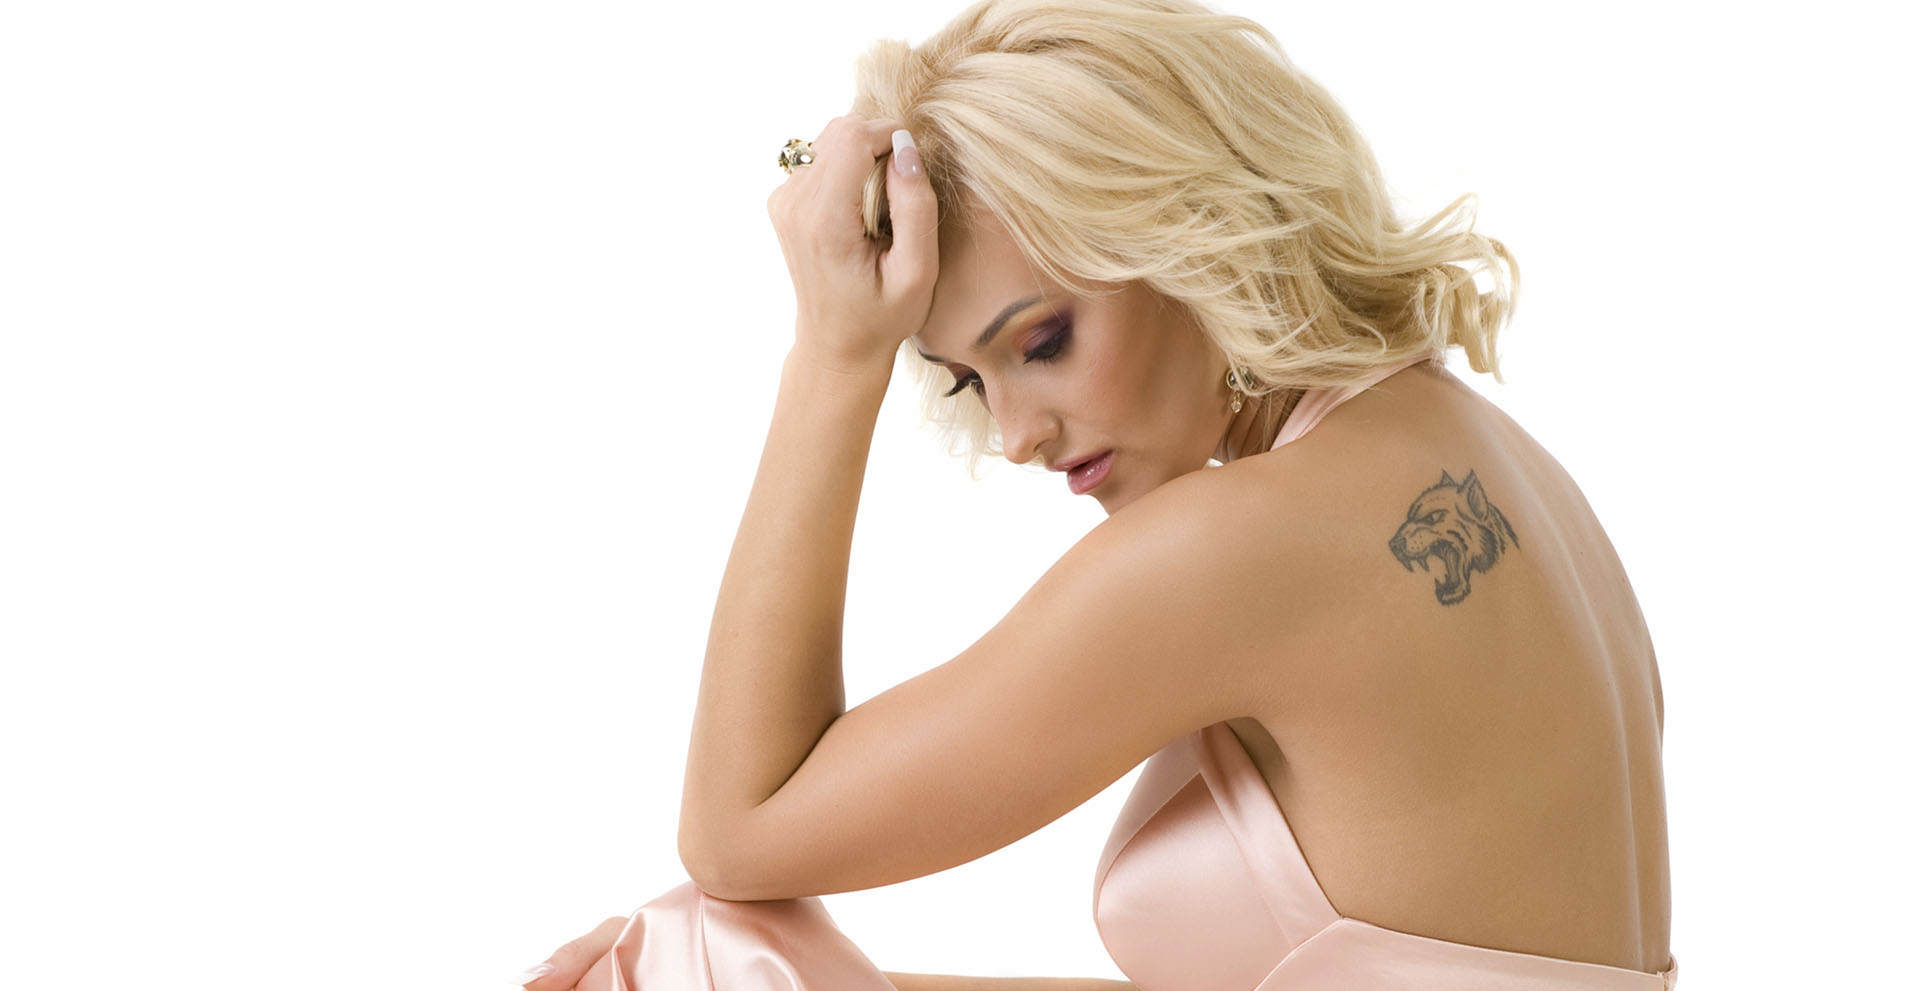 Tattoo Regret? Here's an Alternative.